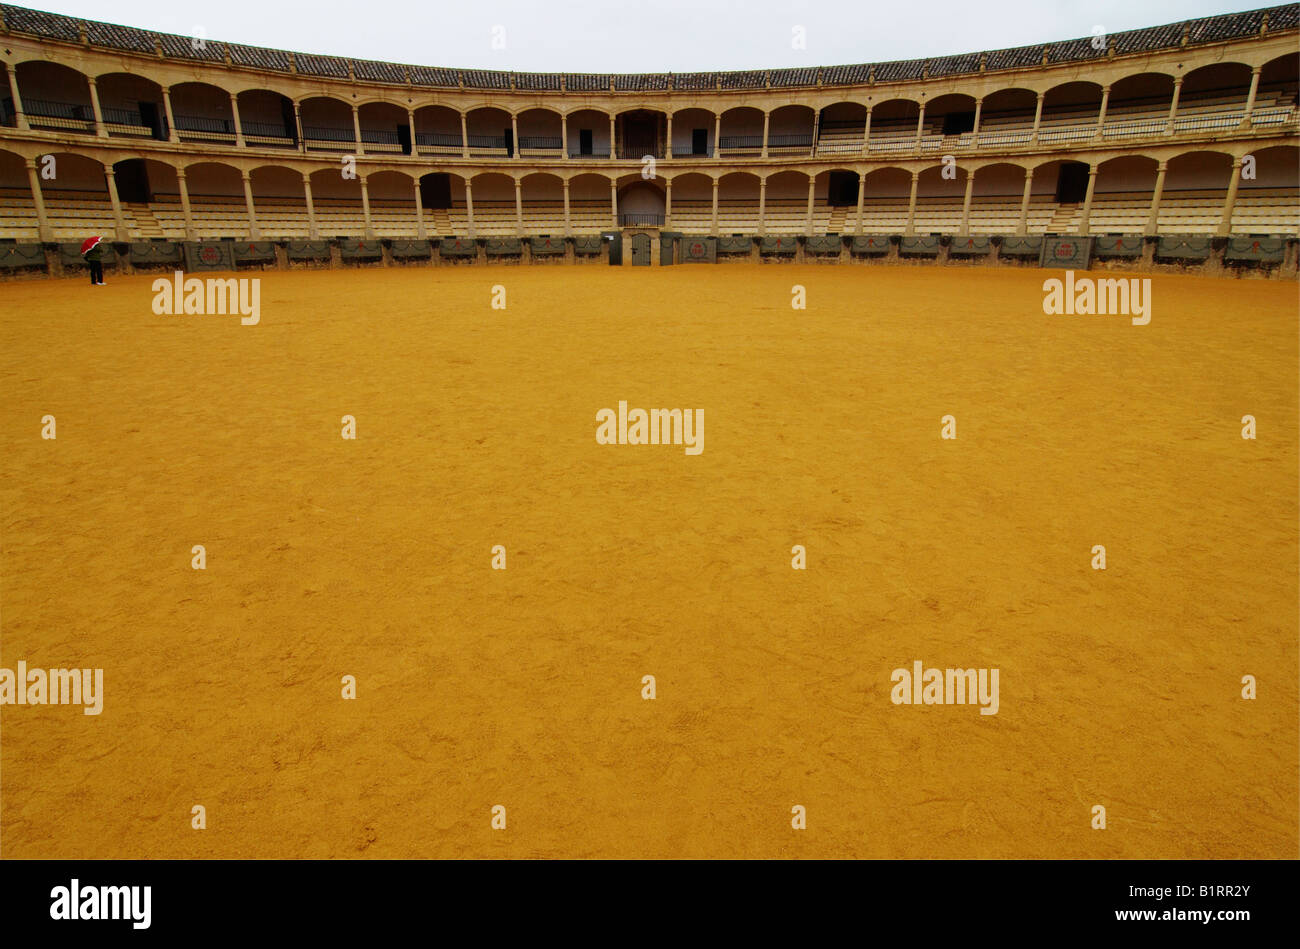 Bullfighting ring, bullring in Ronda, Malaga Province, Andalusia, Spain, Europe - Stock Image